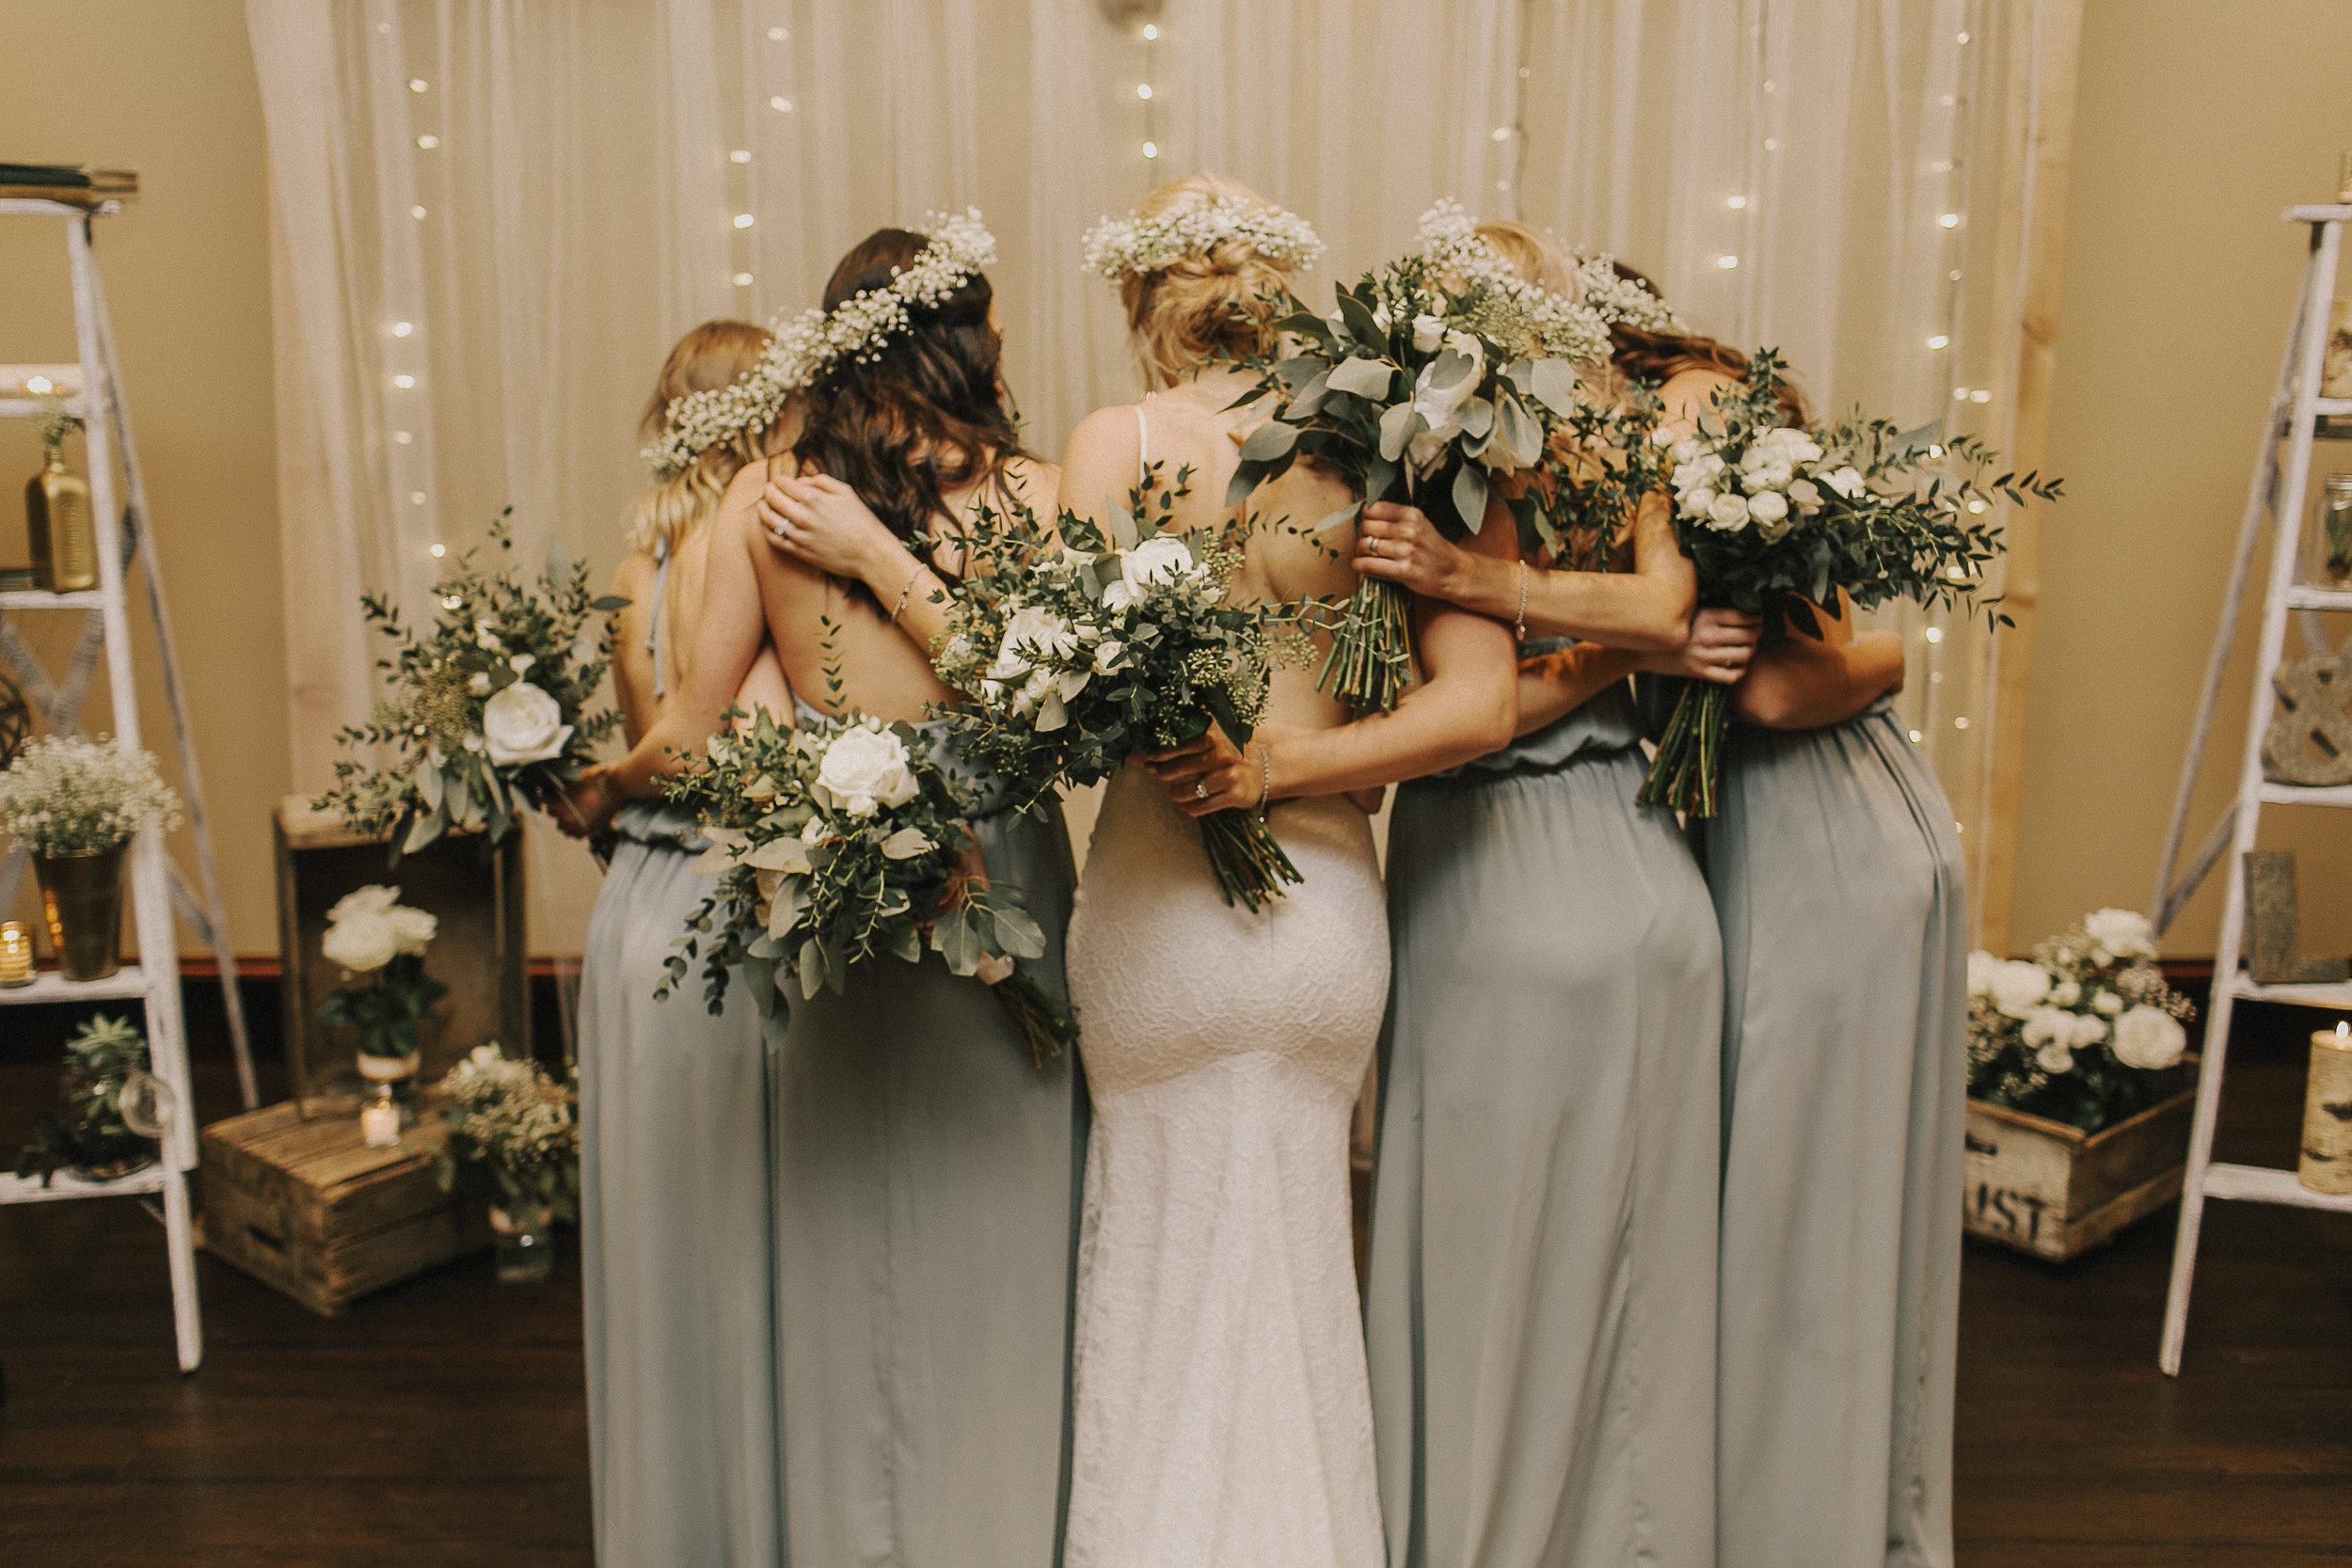 mark-and-liz-wedding-483.jpg